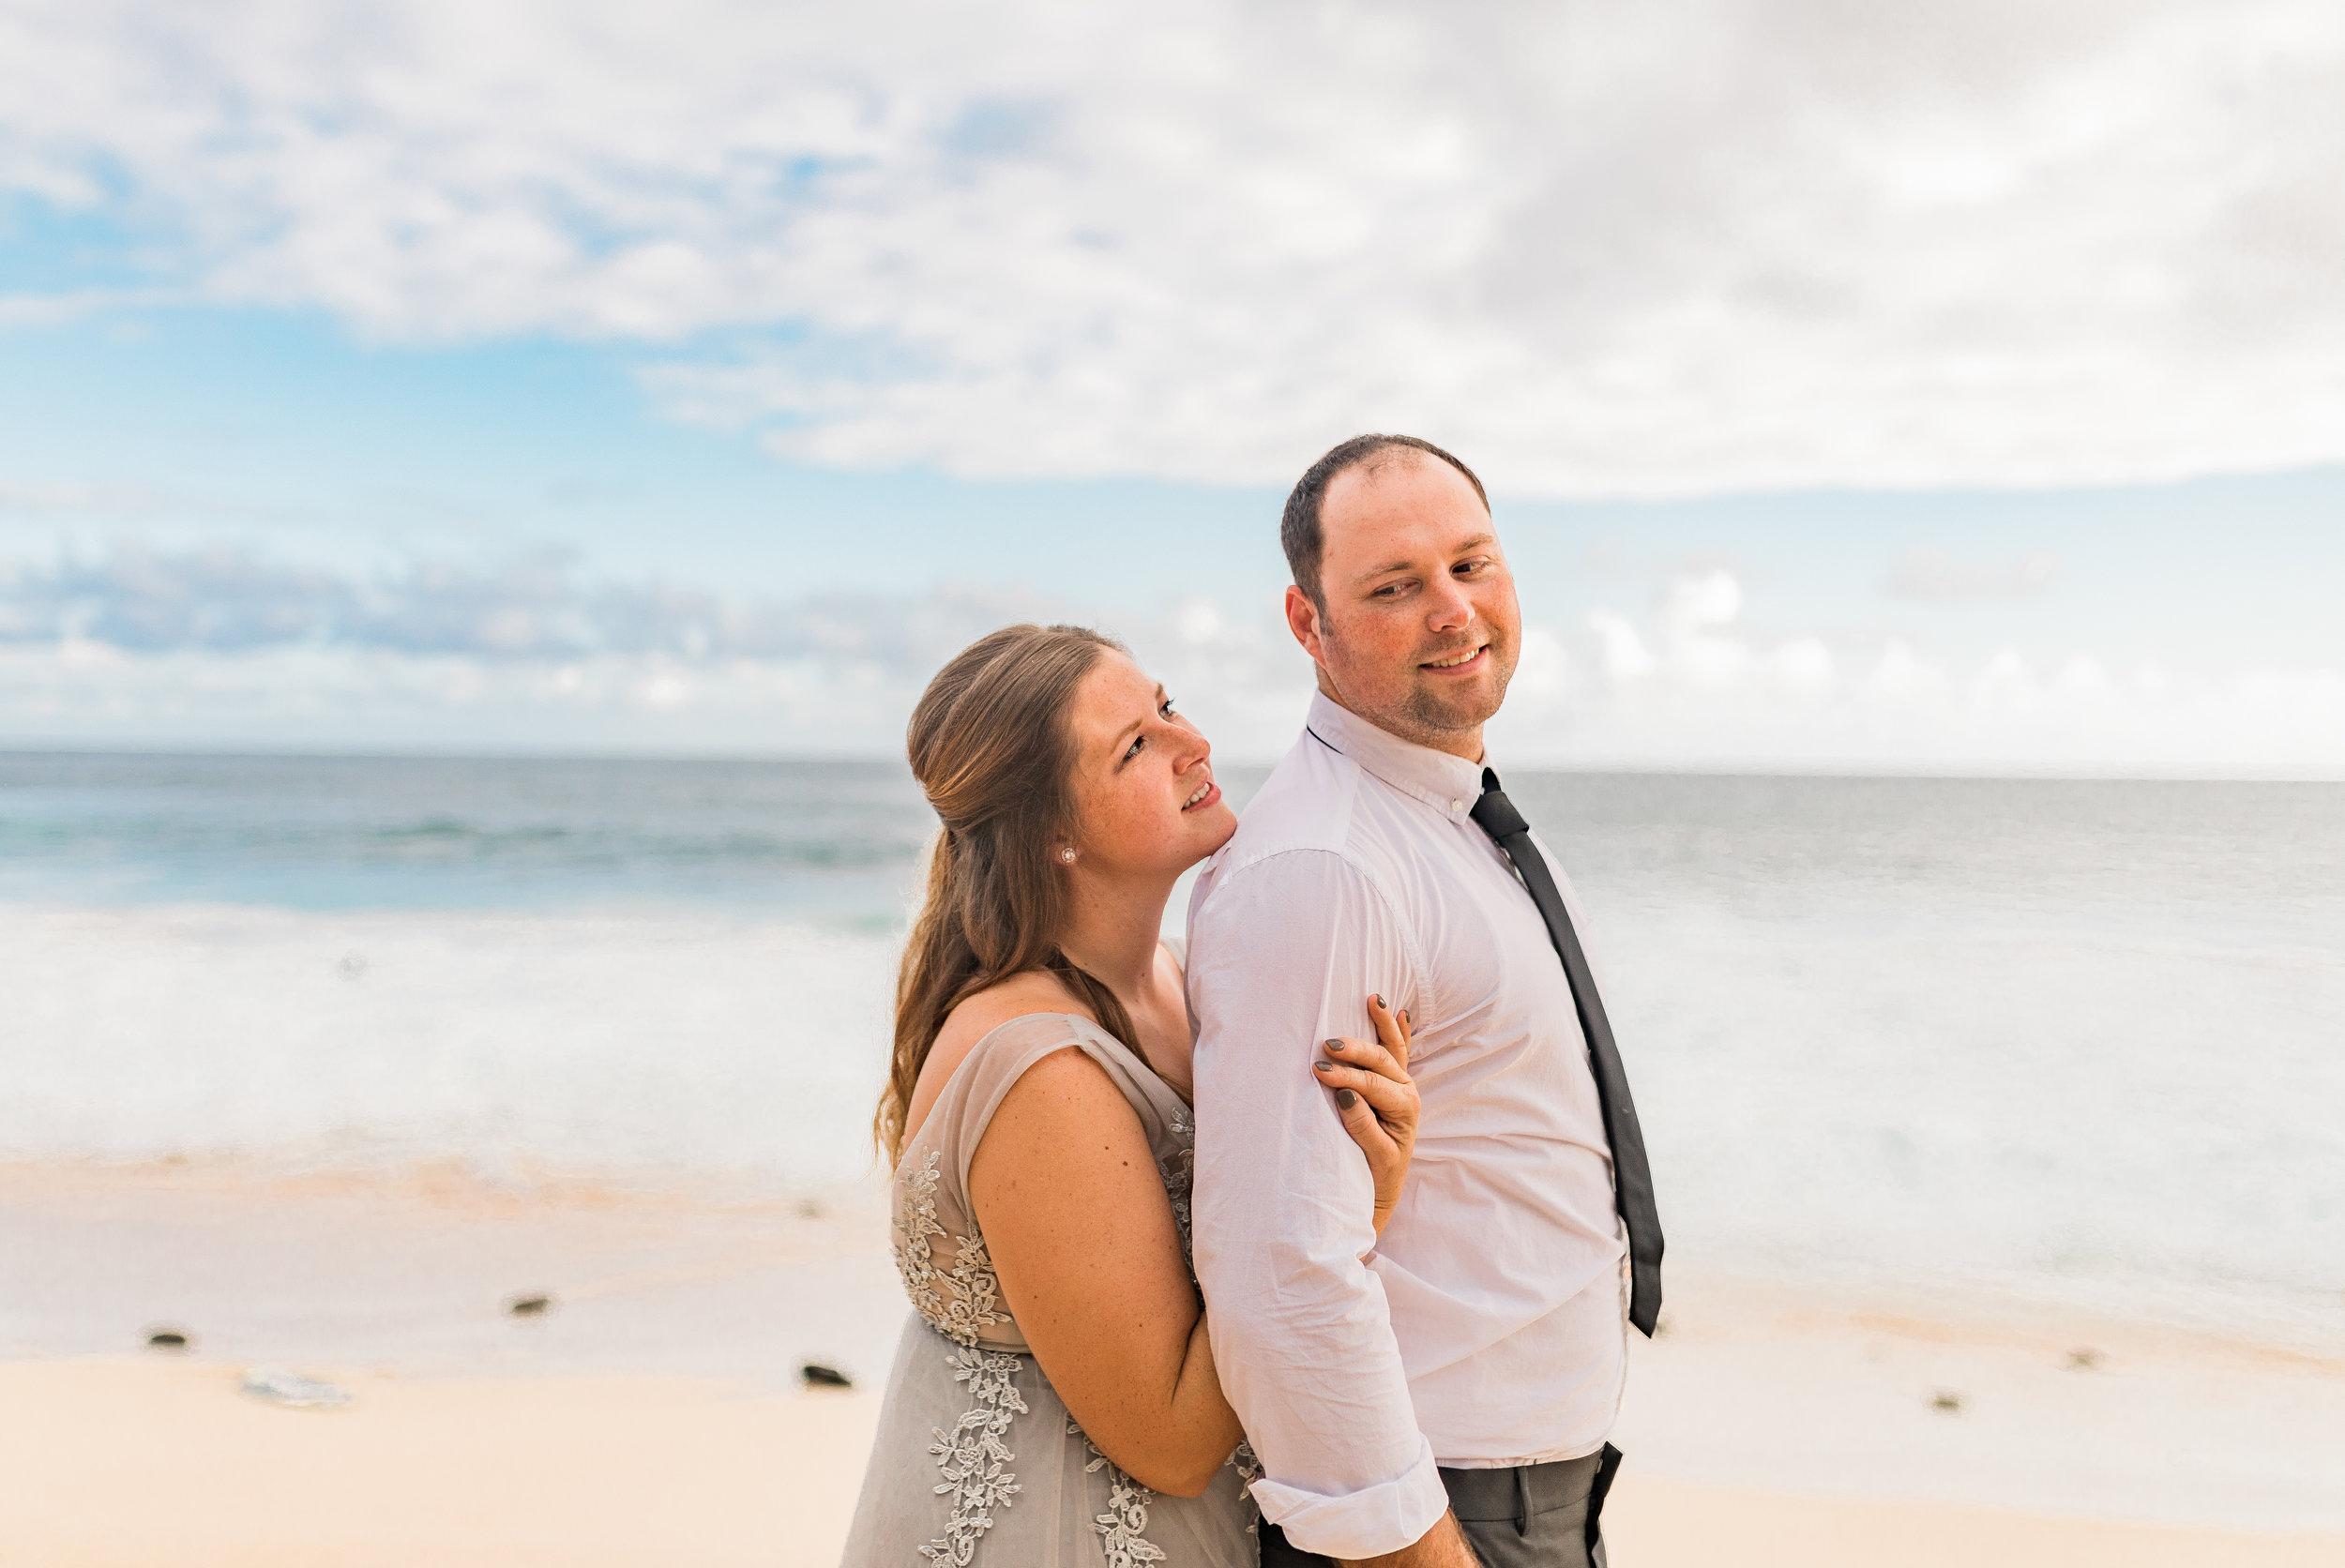 My self and my husband as captured in Kauai Hawaii by the wonderful @Vanessahicks